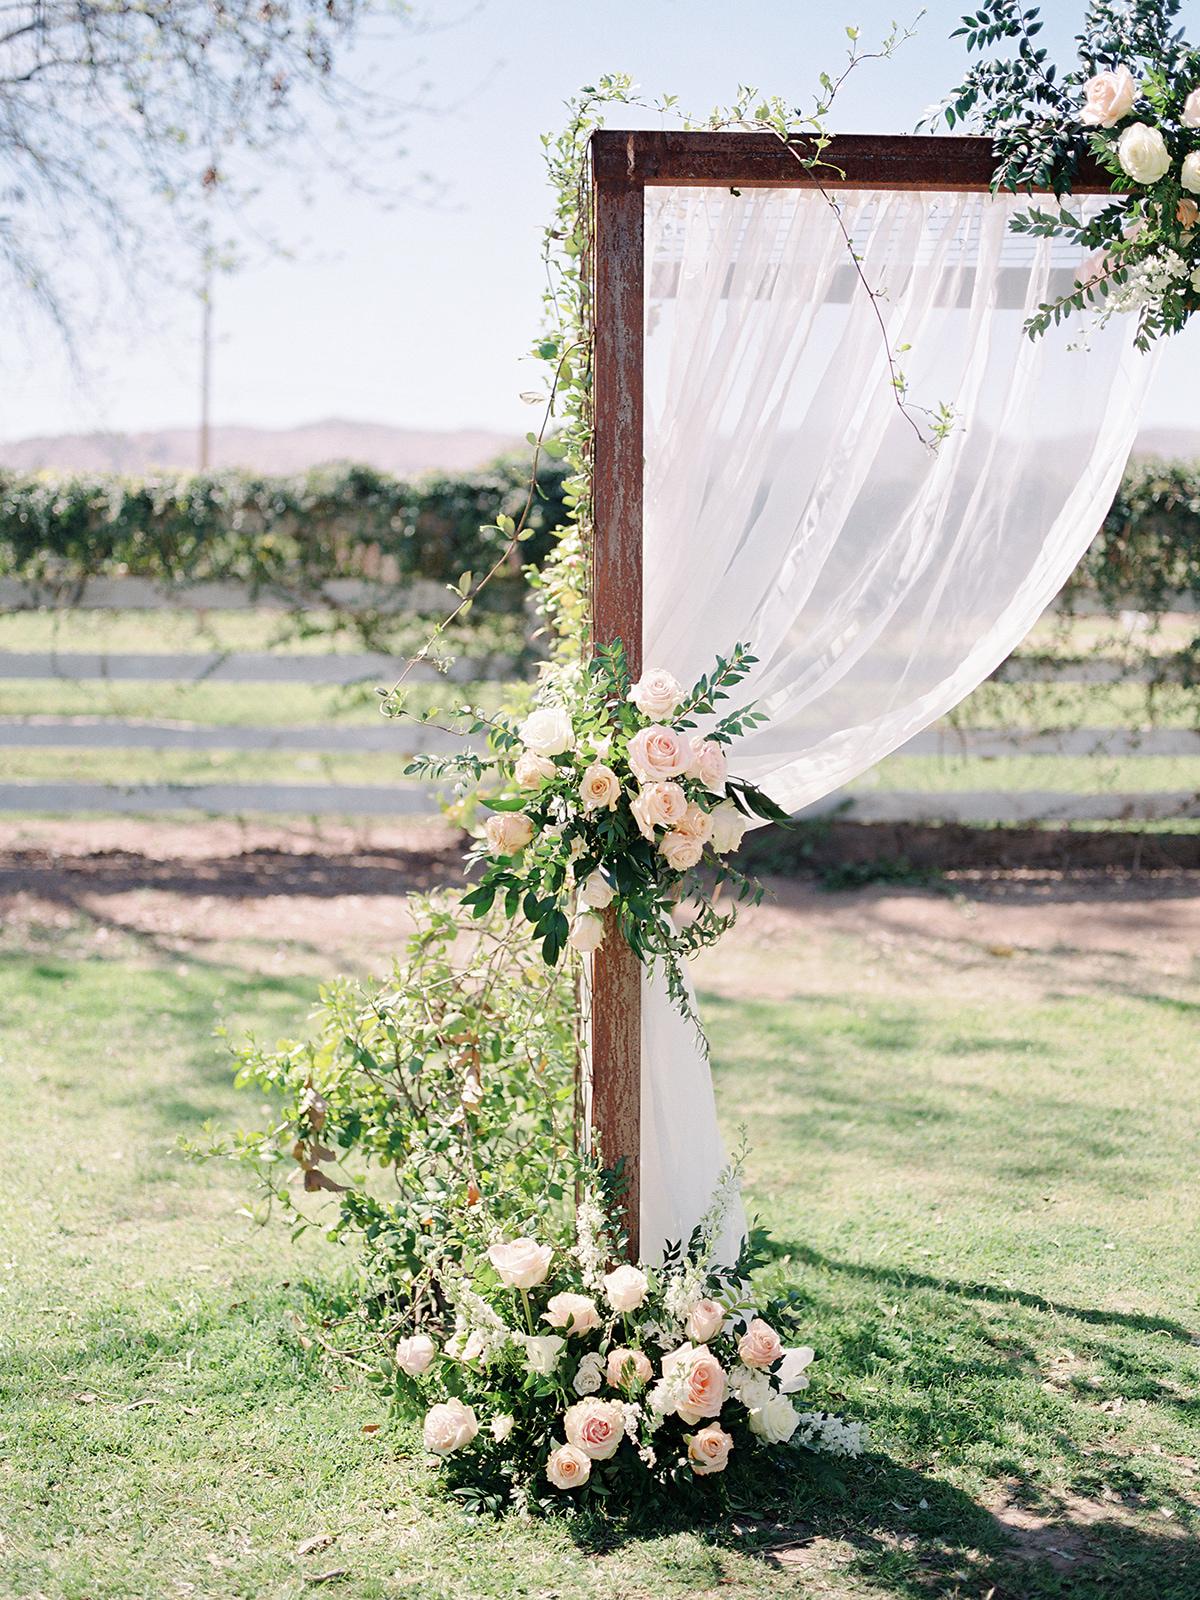 Lukas Wedding - Ceremony-3.jpg